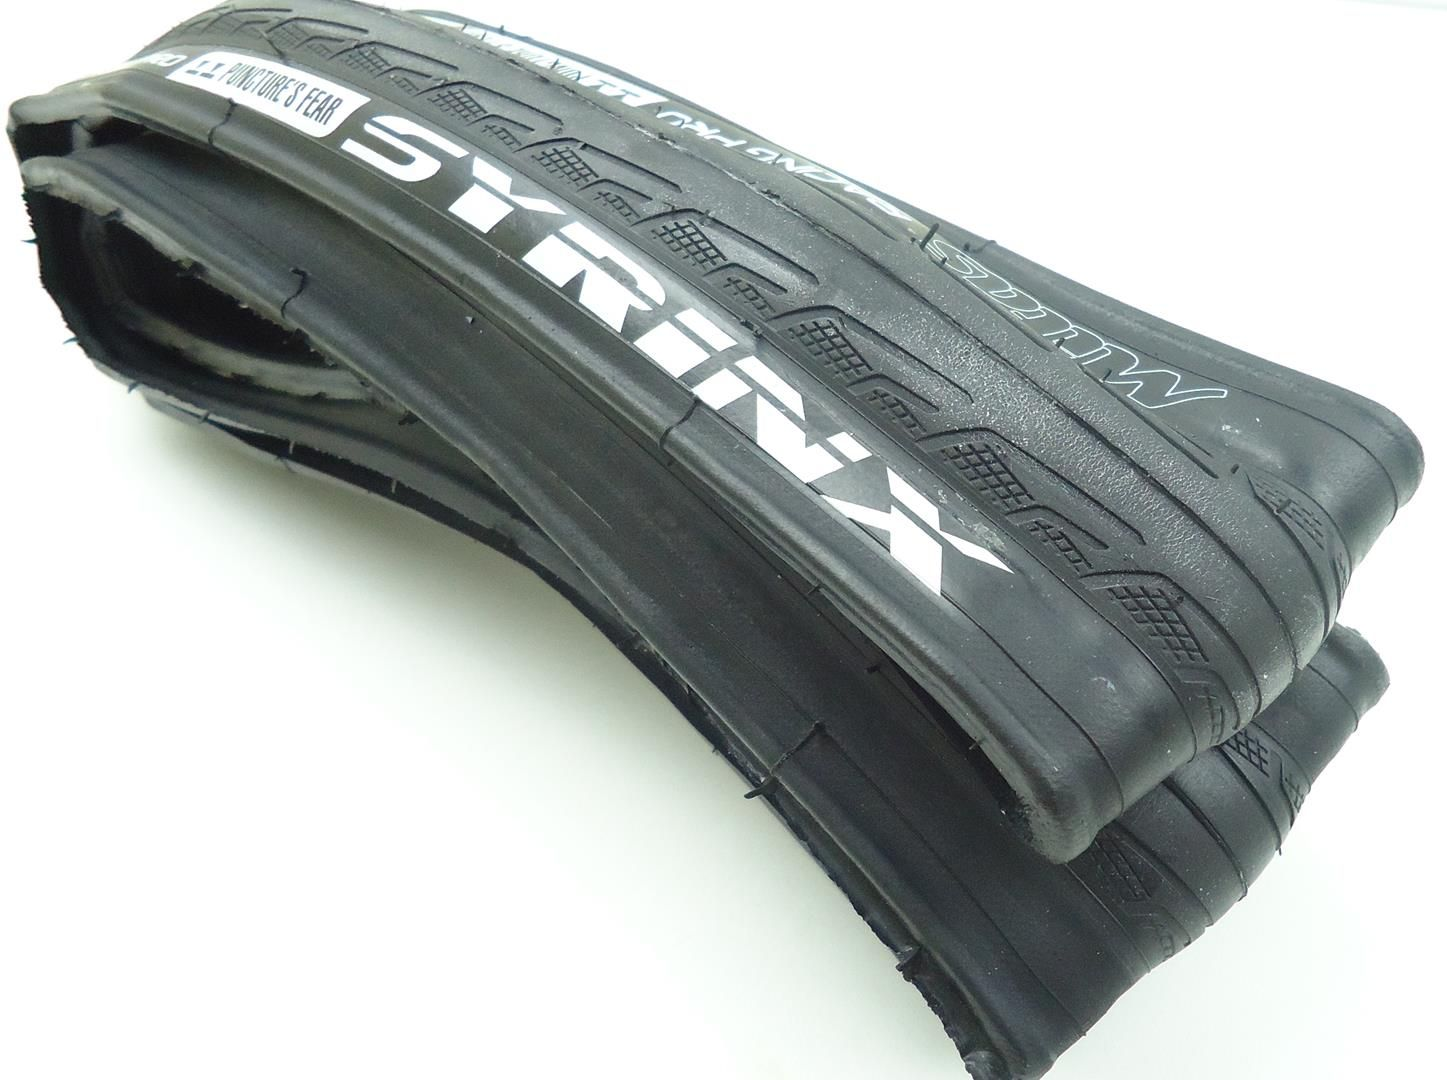 Pneu Bicicleta Speed Mitas Syrinx Racing Pro 700x23 em Kevlar com proteção Anti-furo